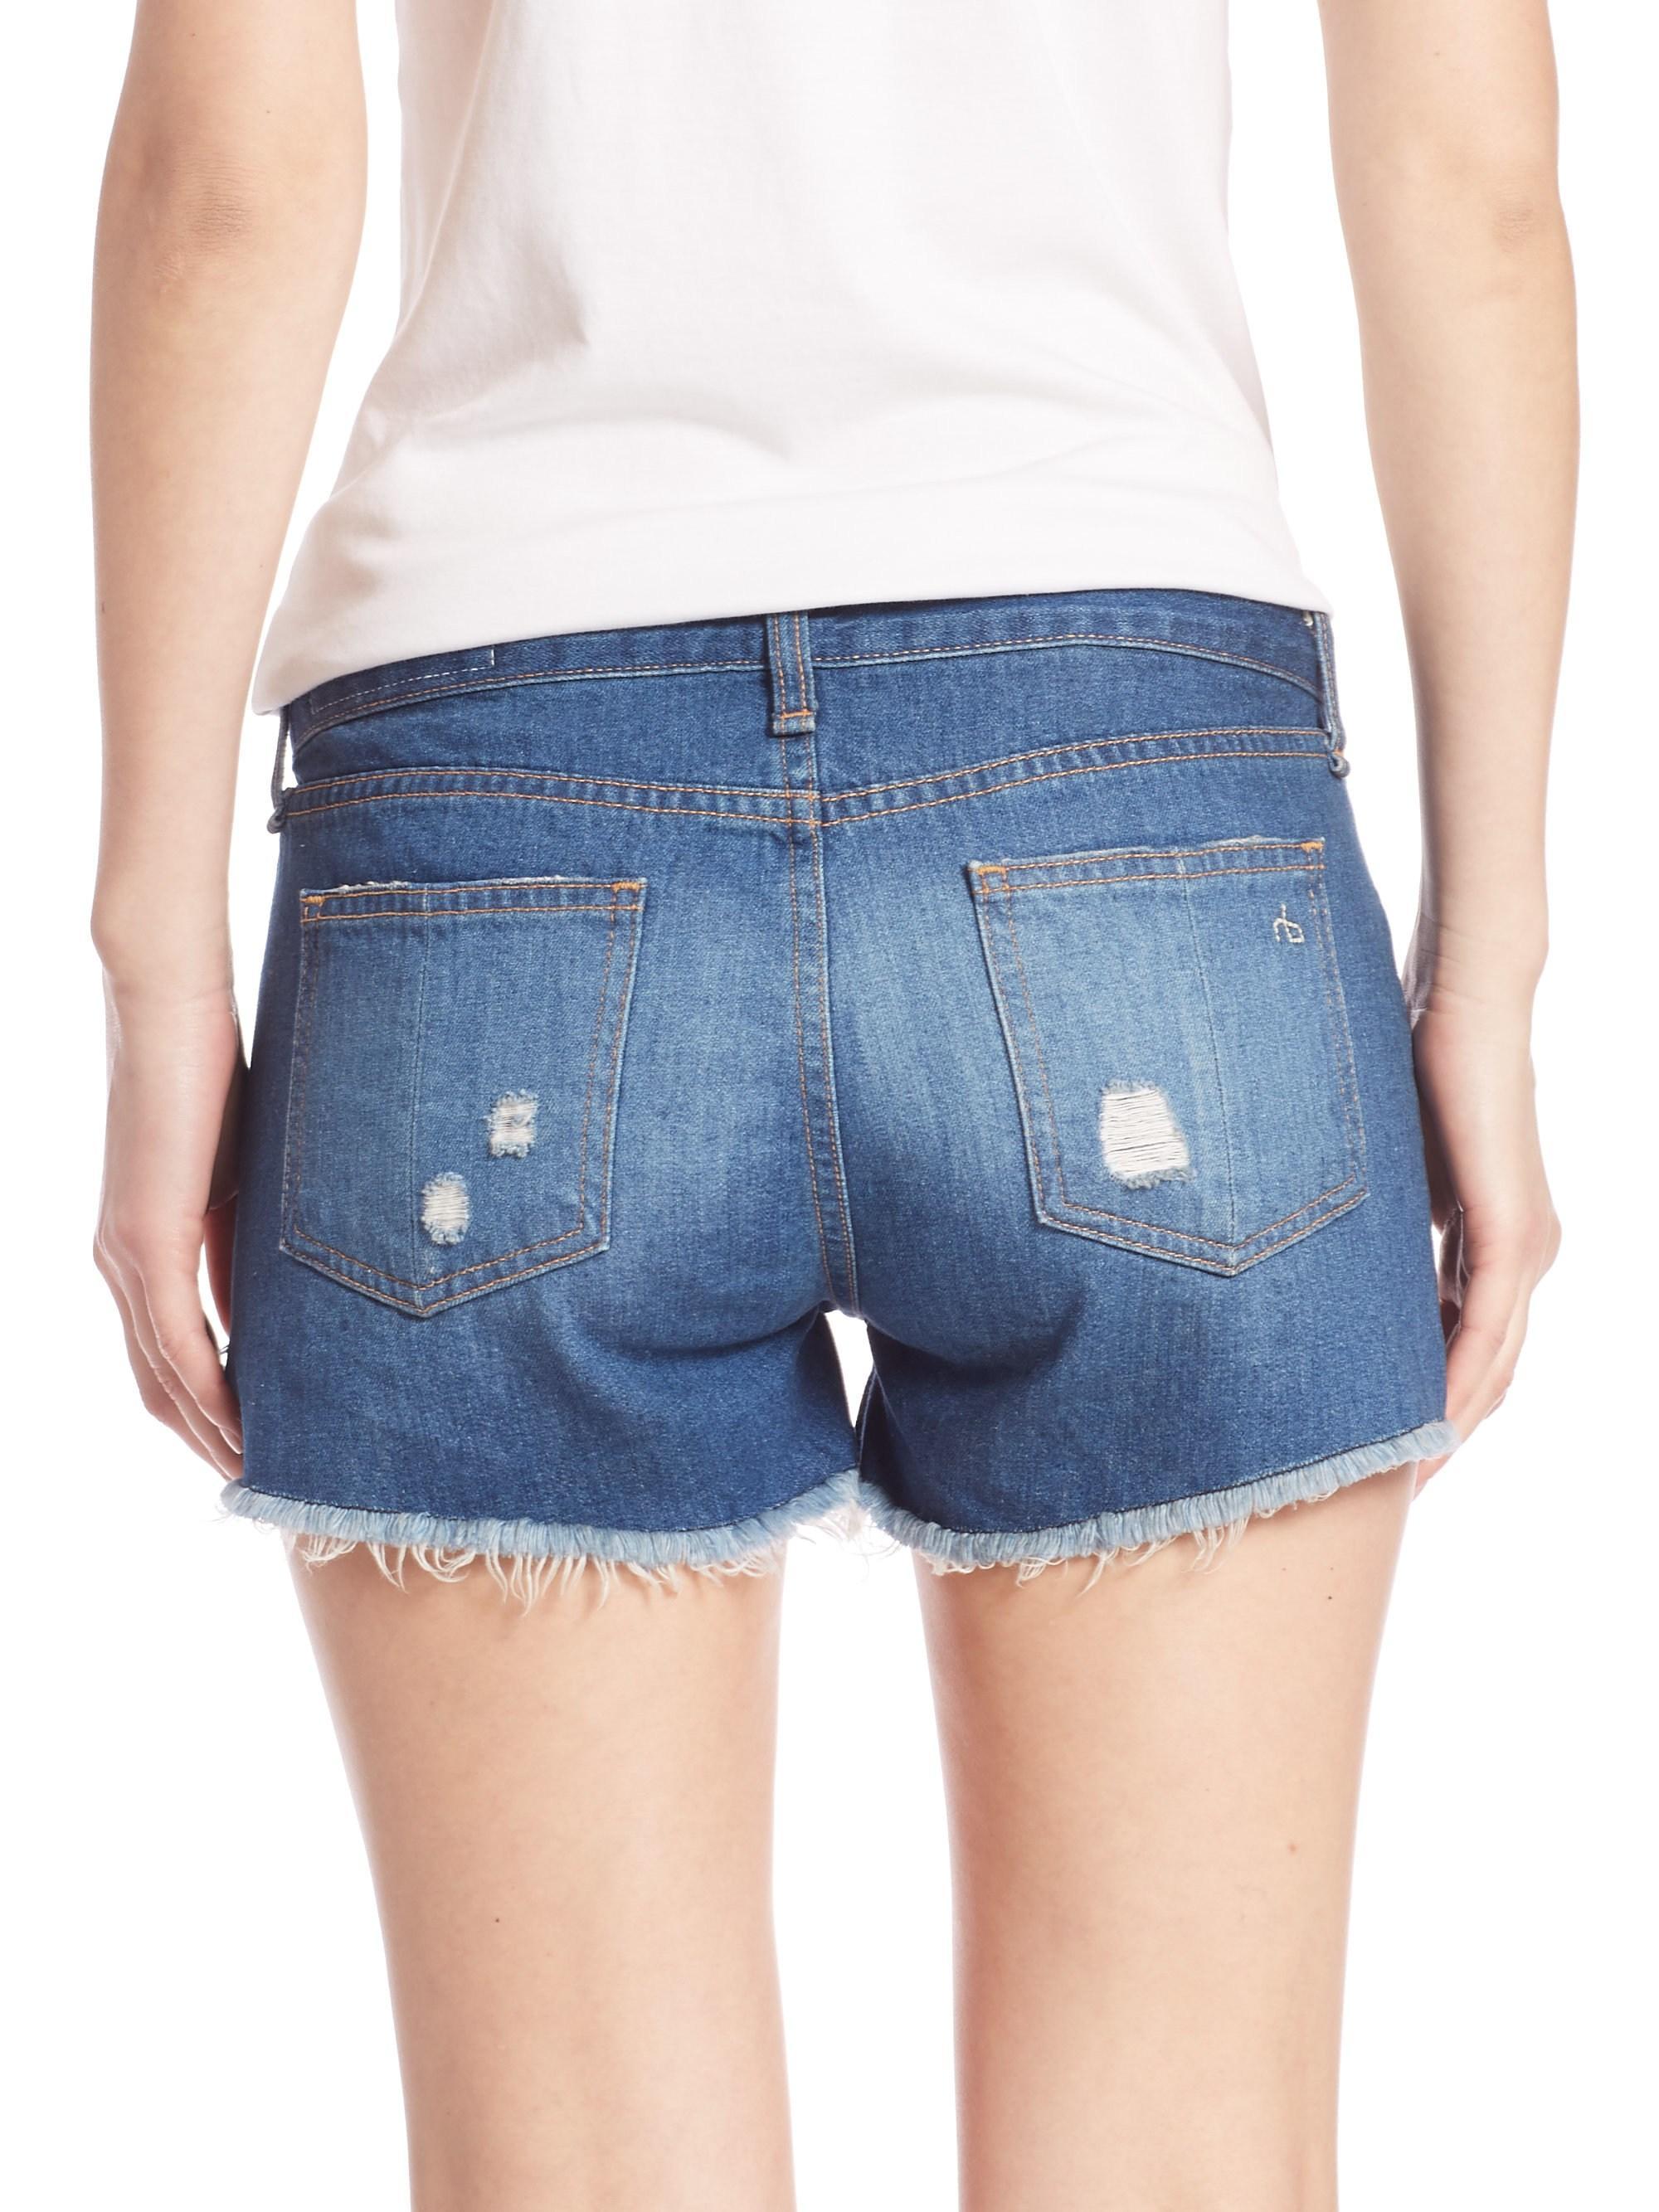 31b65a00e38 Rag   Bone - Blue Cut-off Distressed Denim Shorts freeport - Lyst. View  fullscreen